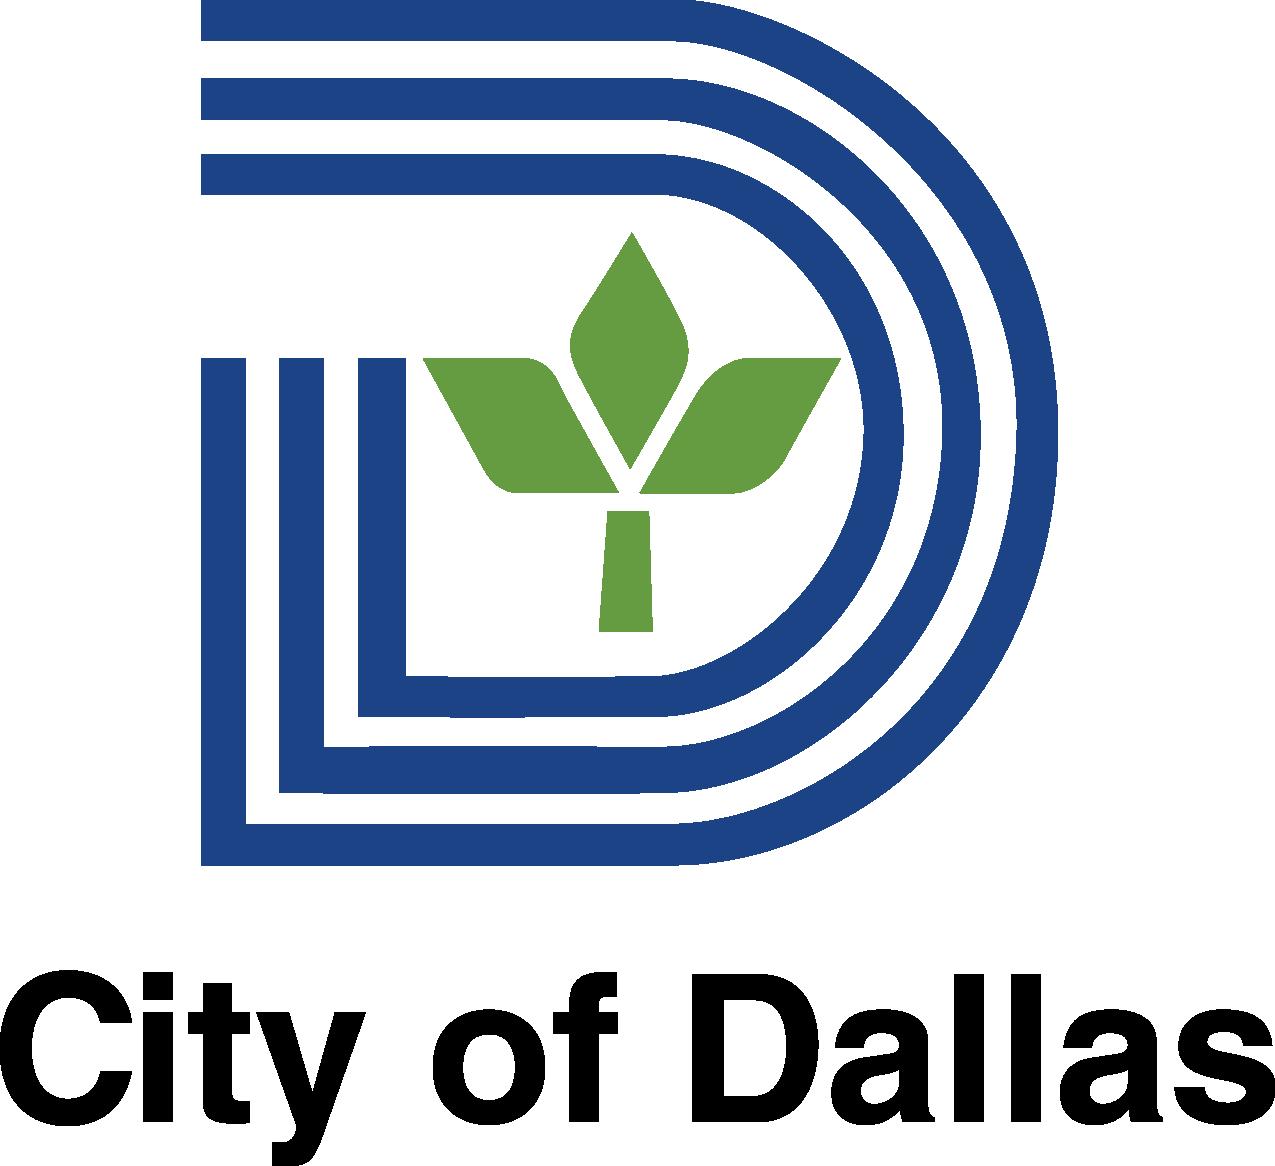 City of Dallas - Vertical - Full Color-1